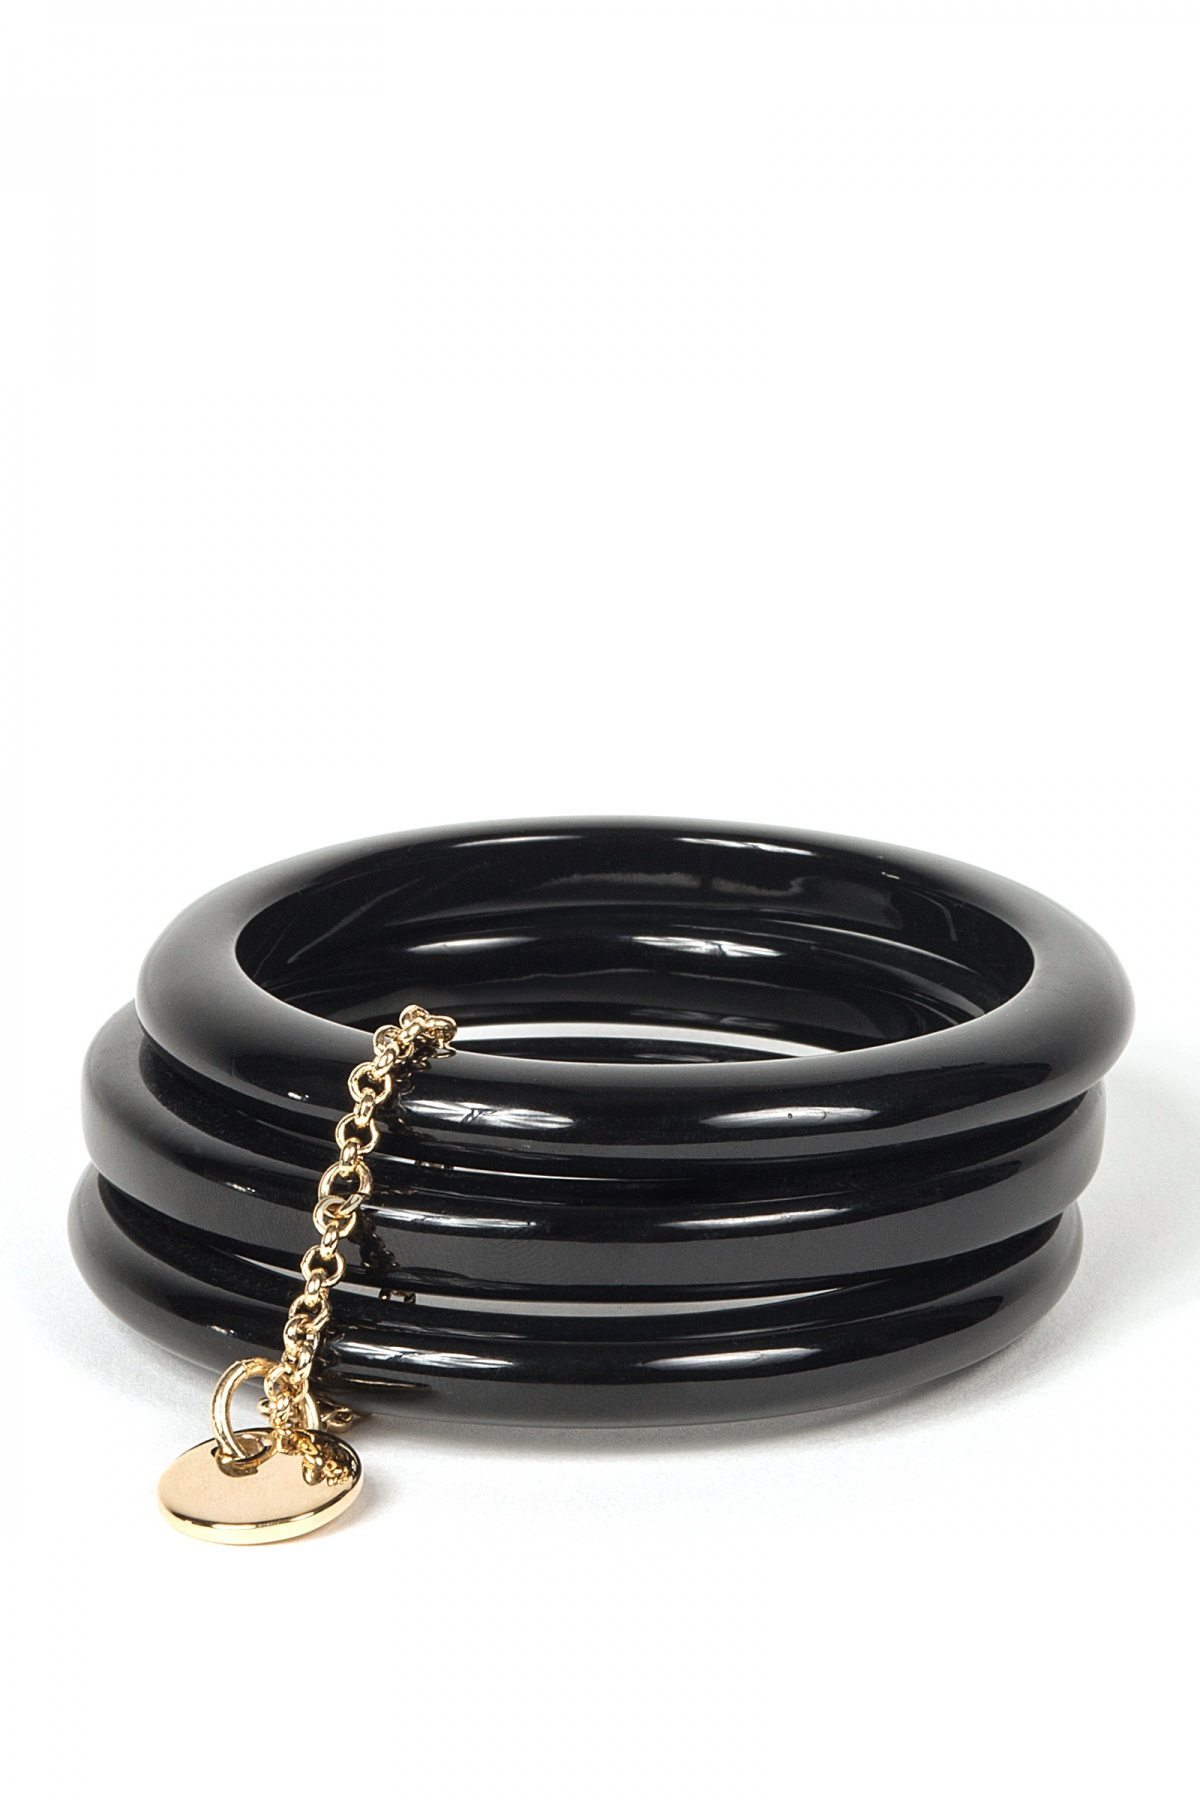 Brațara EXBR5000 Negru